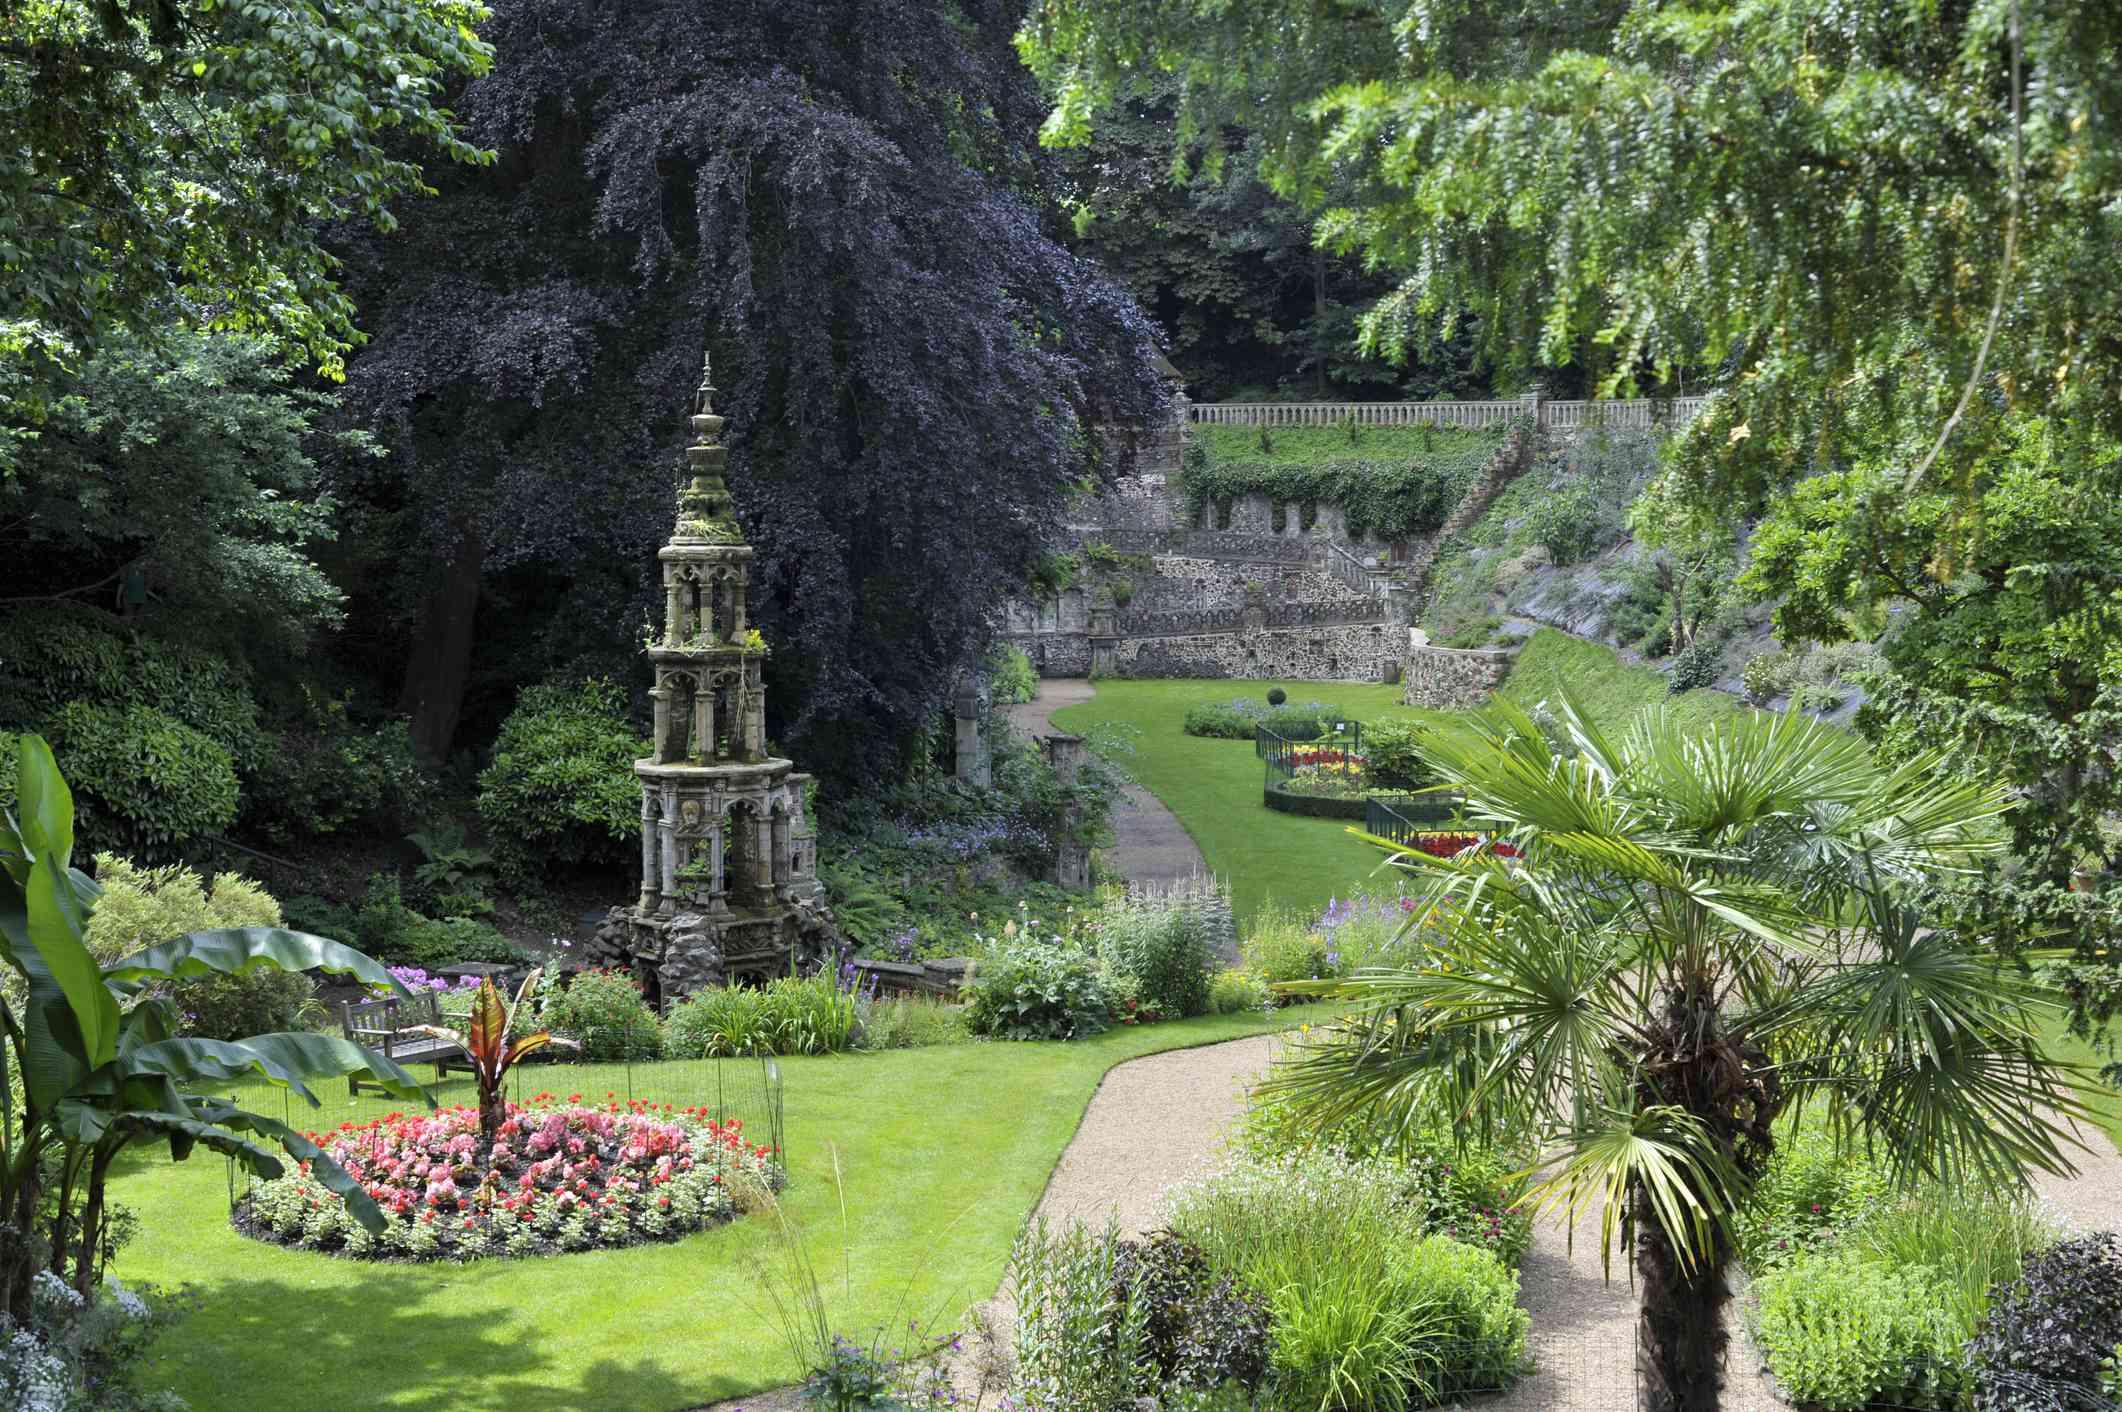 The Plantation Garden in Norwich, England